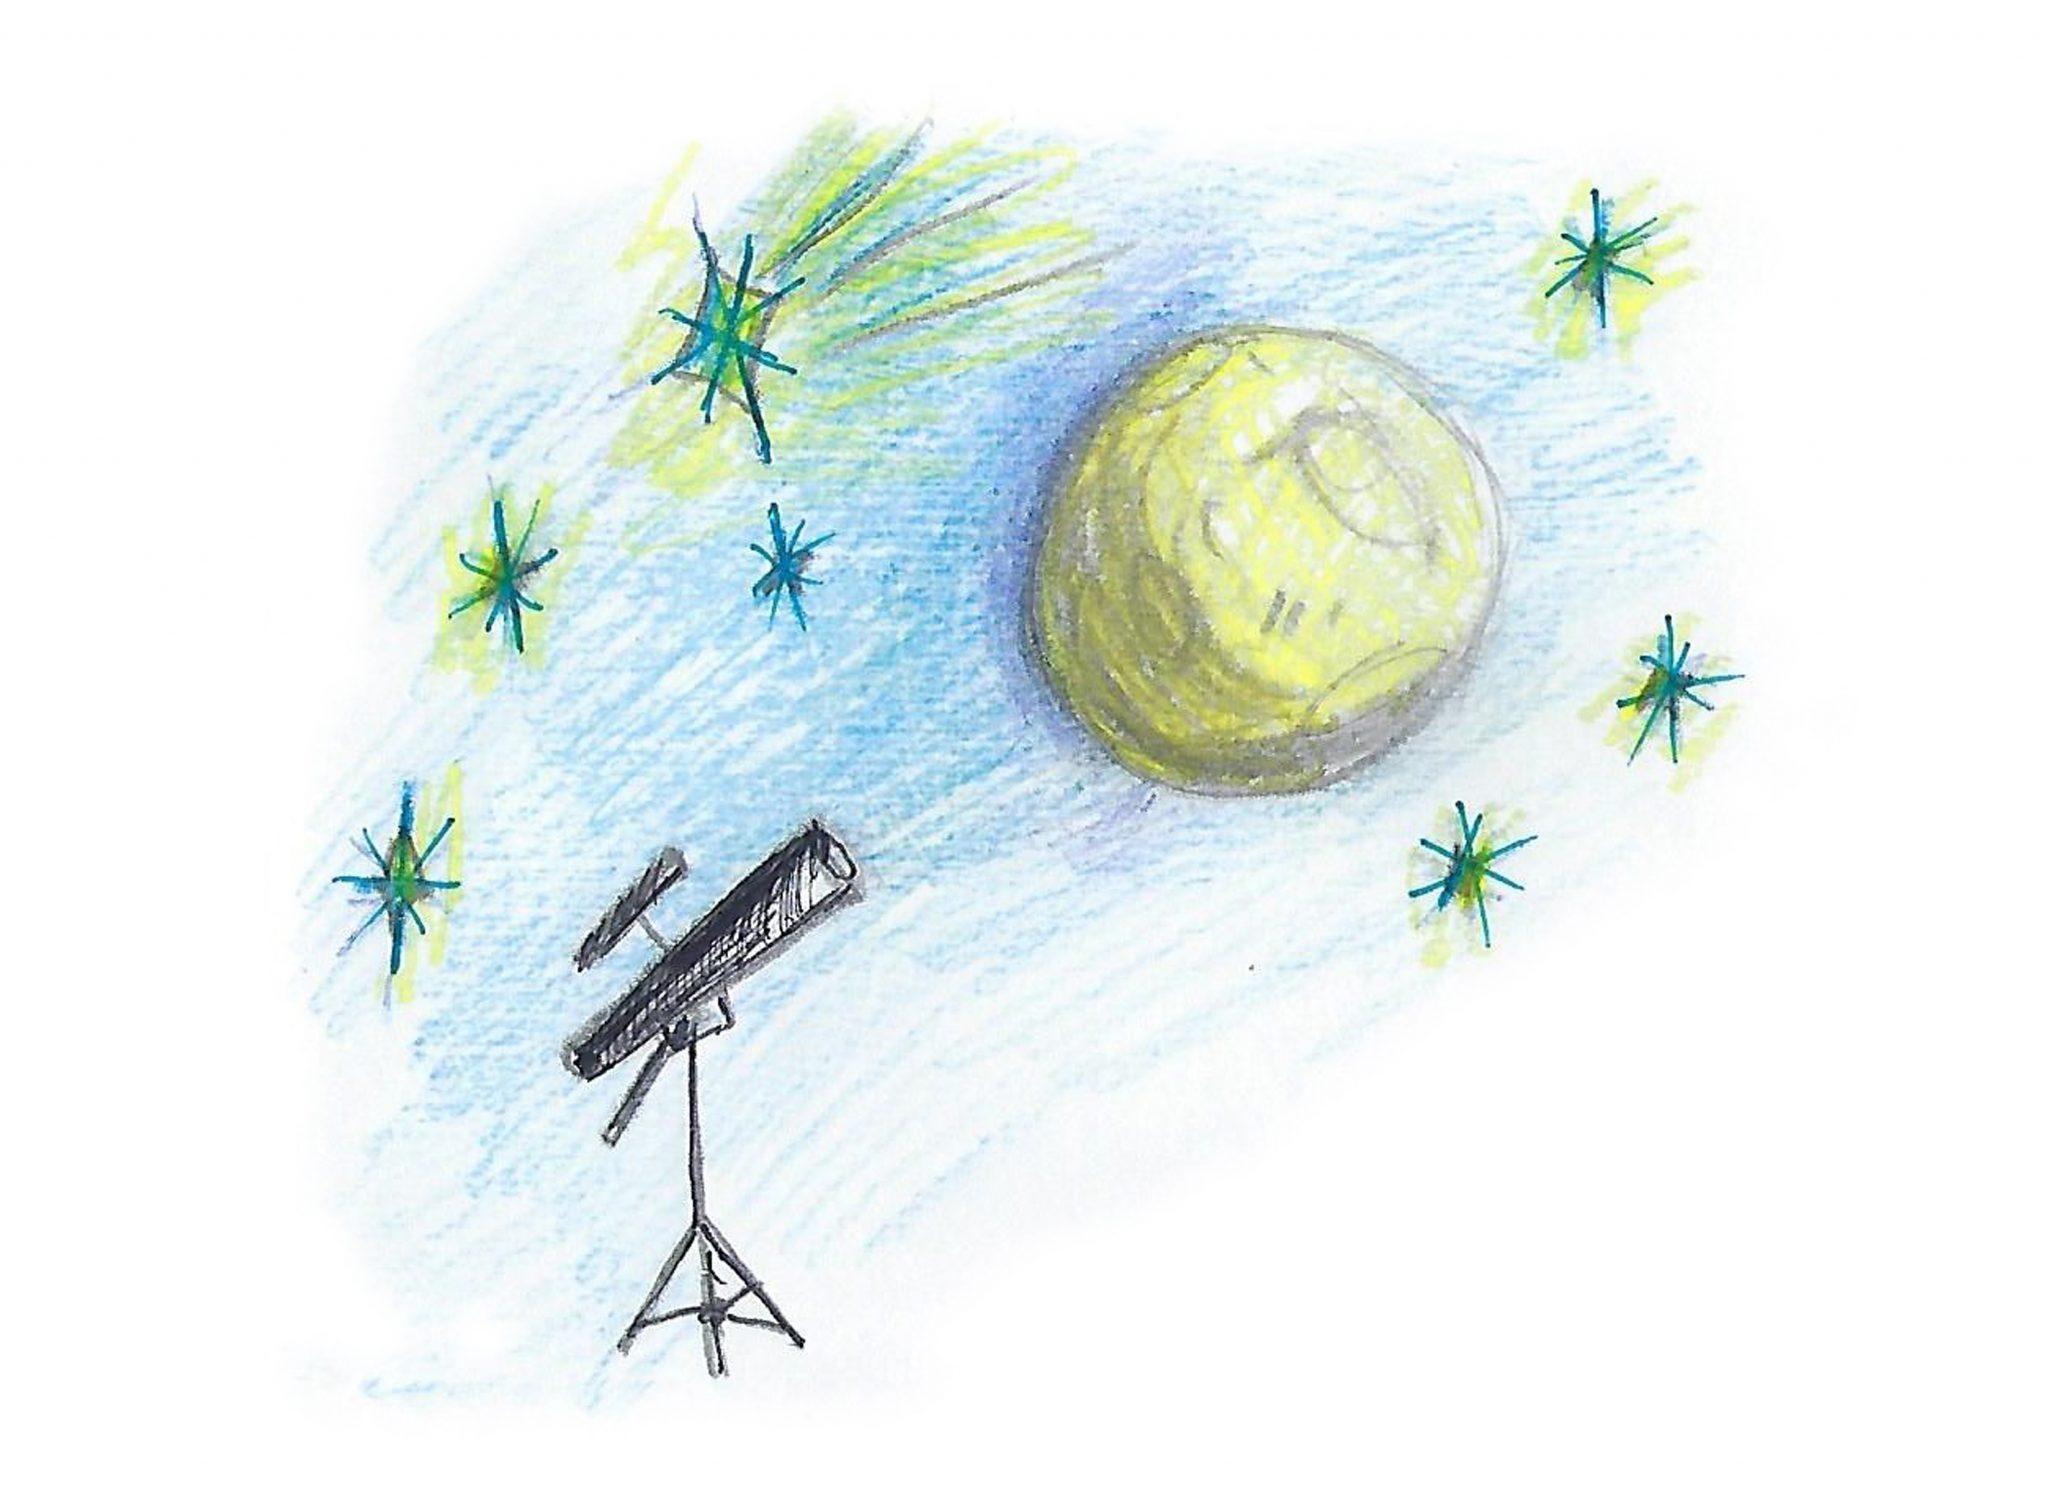 Мы смотрим на Луну! —We look at the moon!